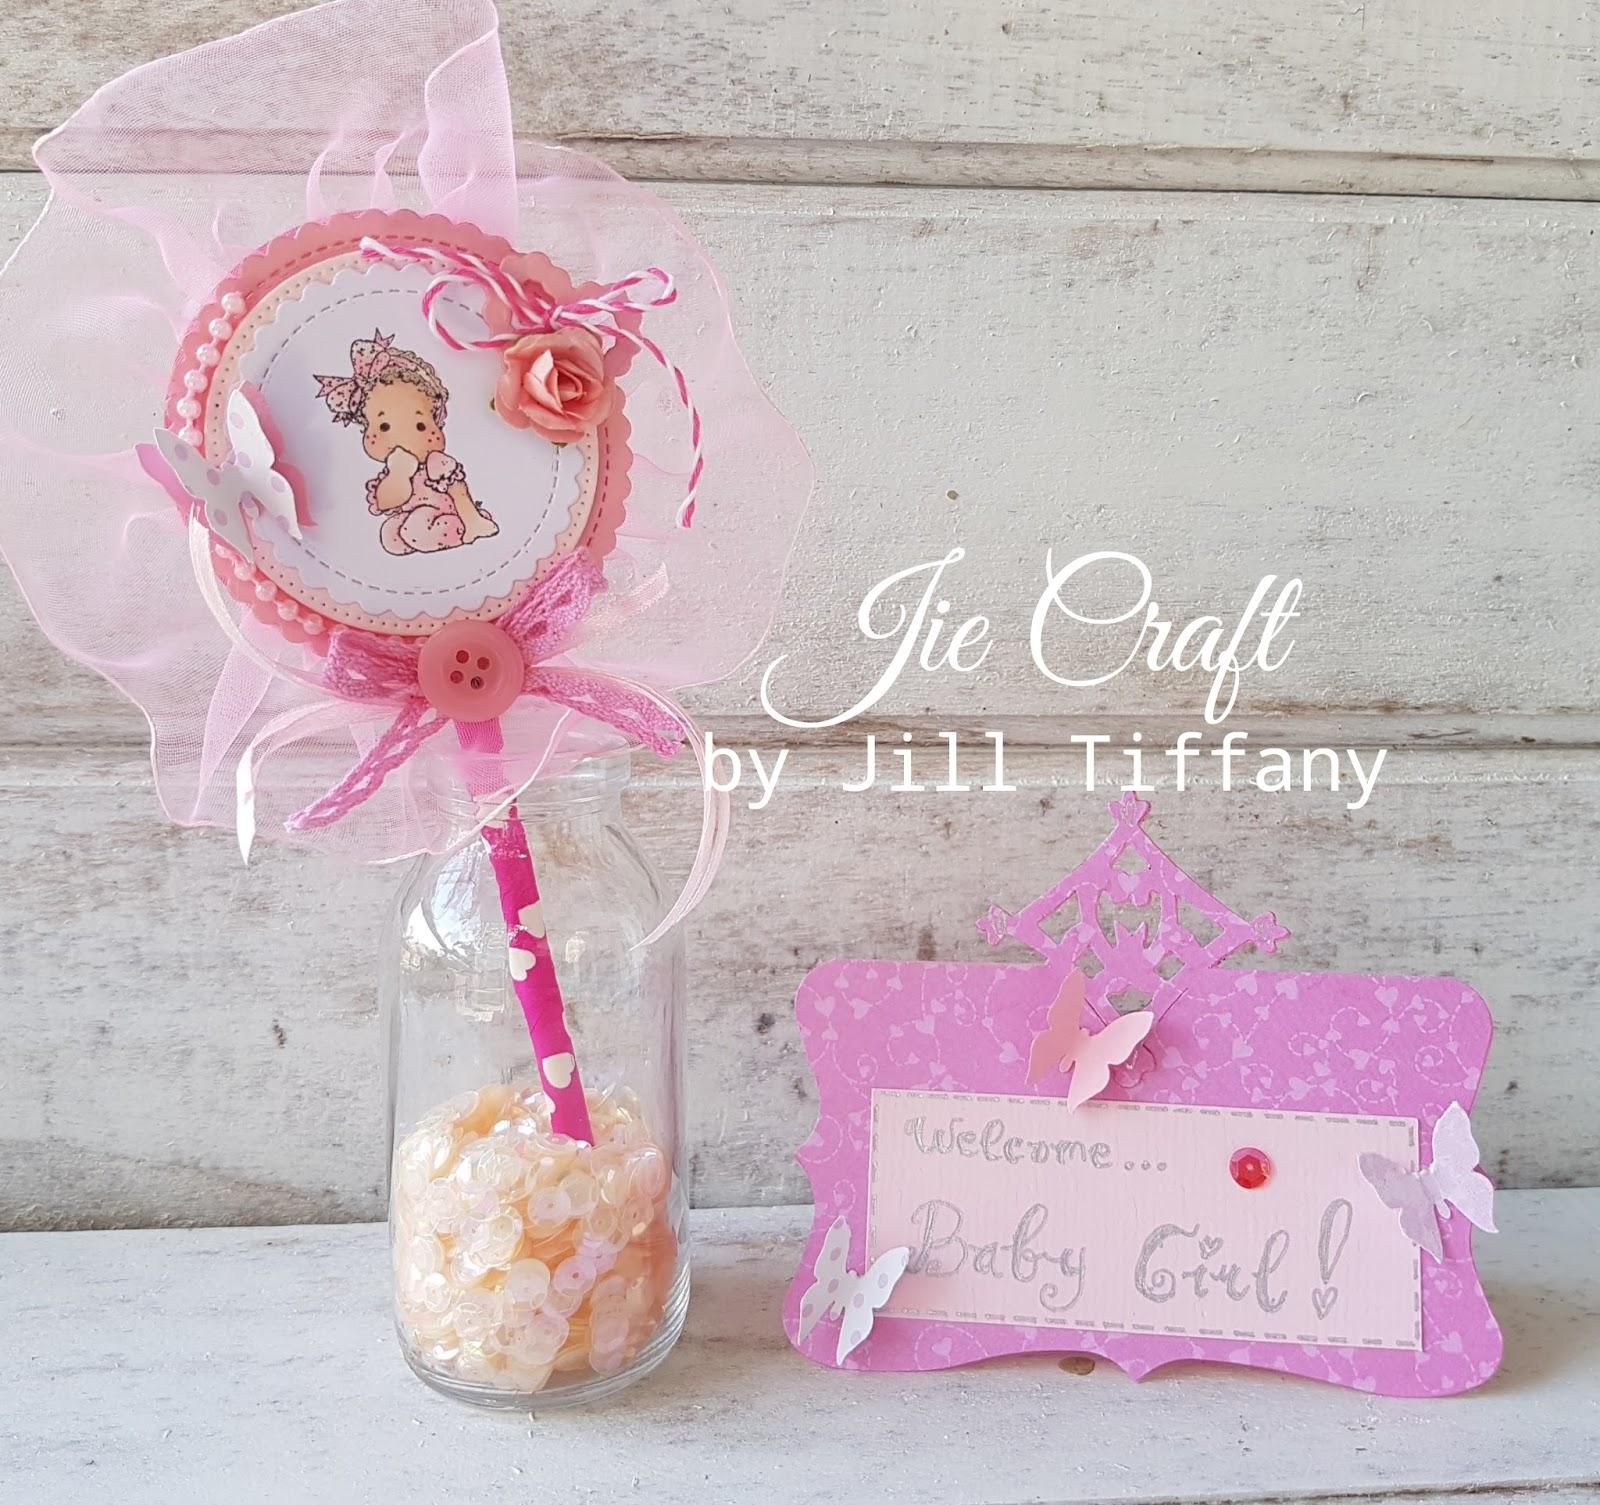 Jie Craft by Jill Tiffany